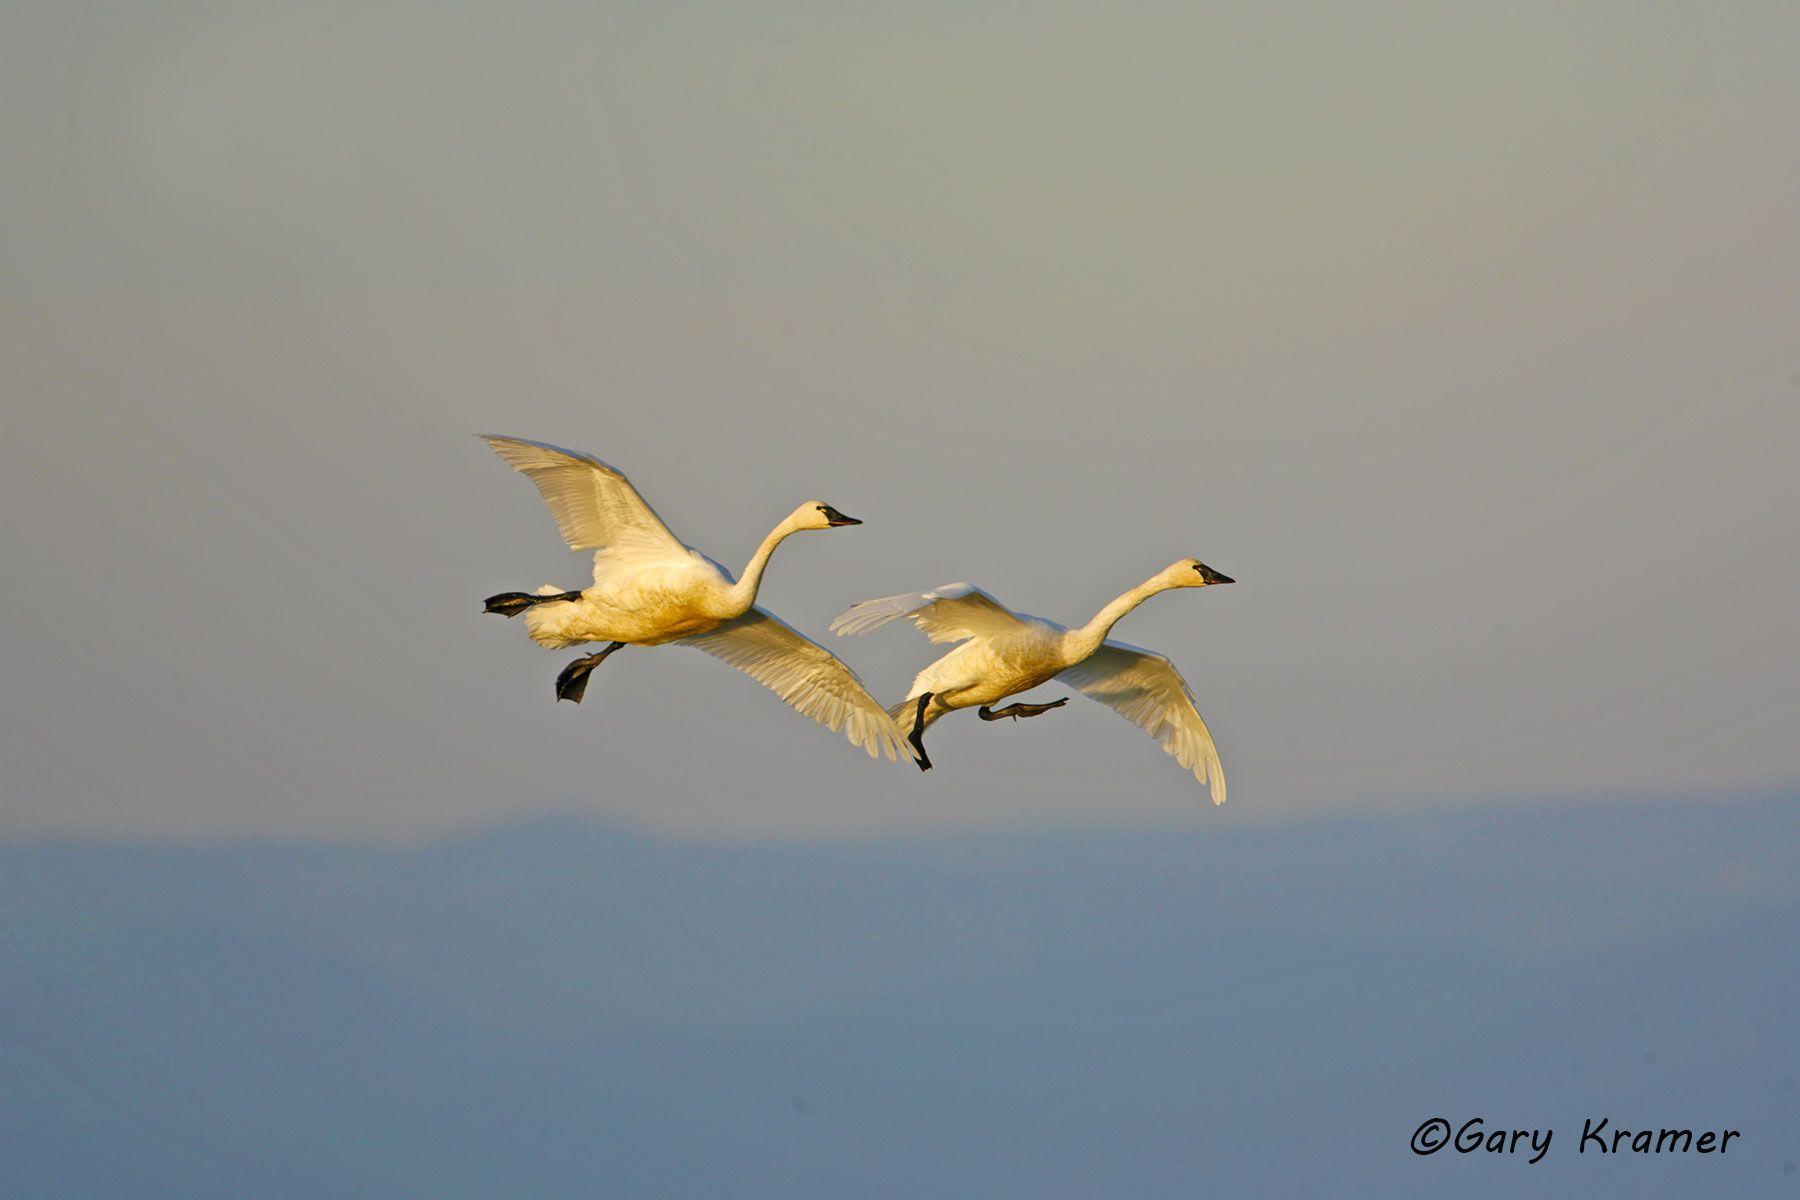 Tundra (Whistling) Swan (Cygnus columbianus) - NBWT#177d